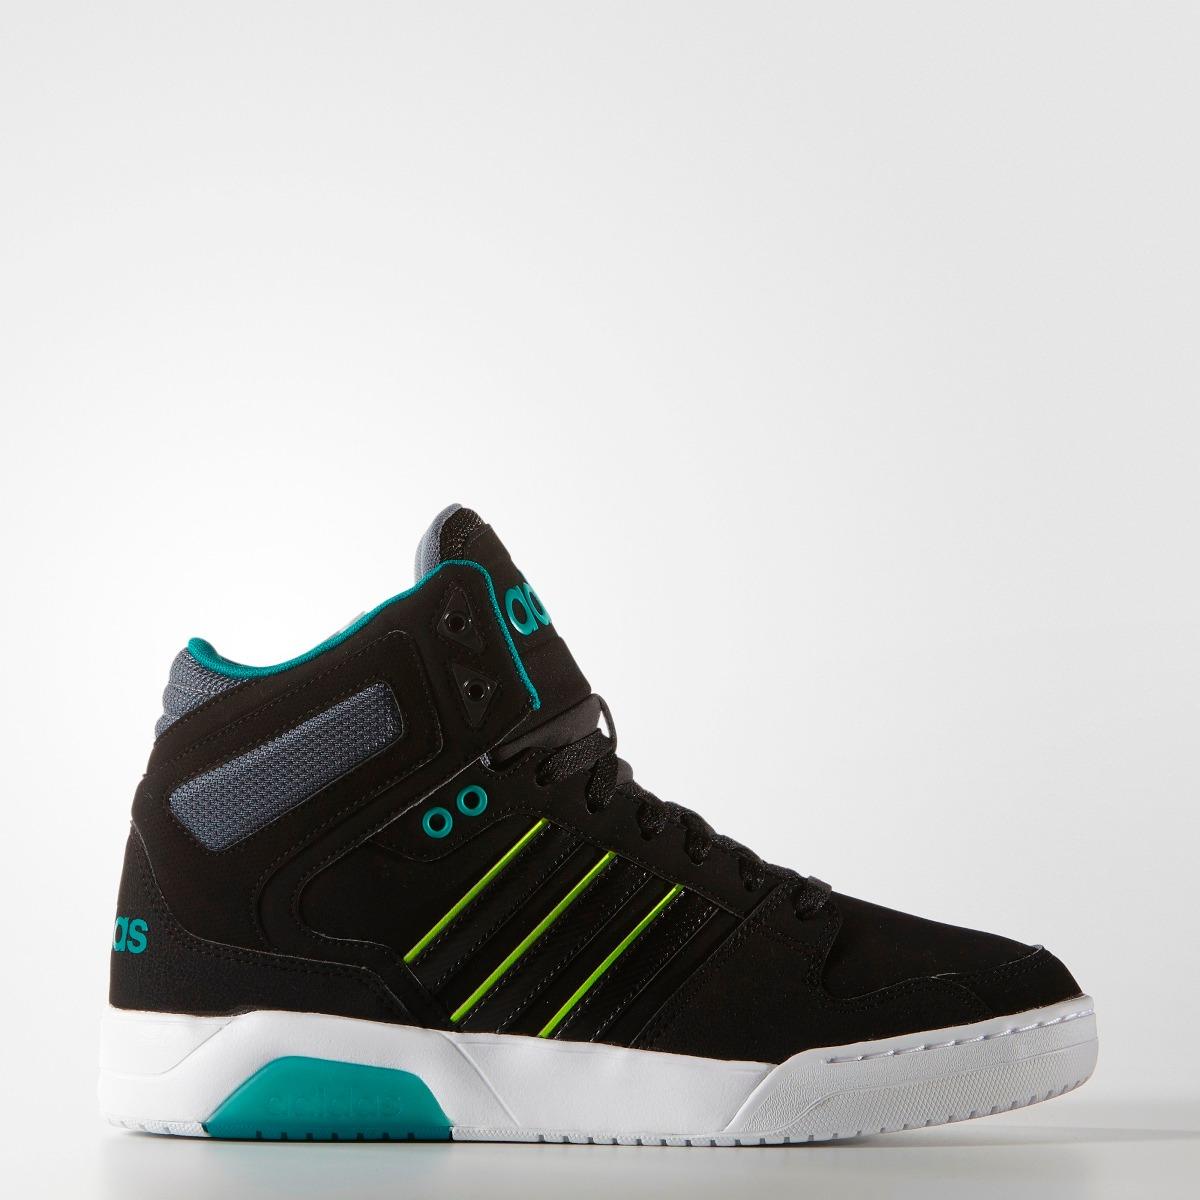 Adidas Neo Hombre 2013